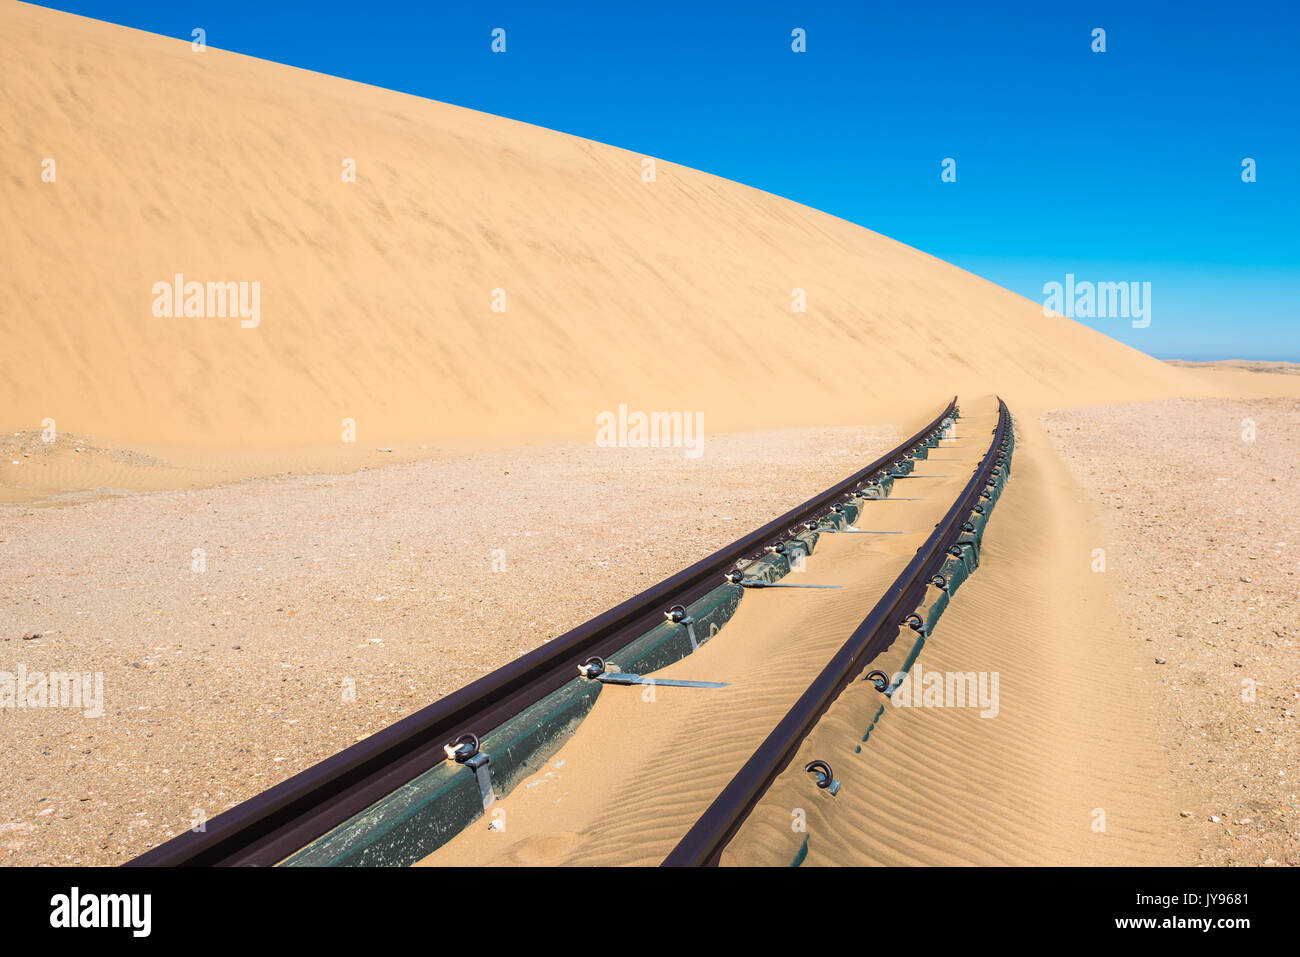 Railway tracks after sand storm, Namibia - Stock Image